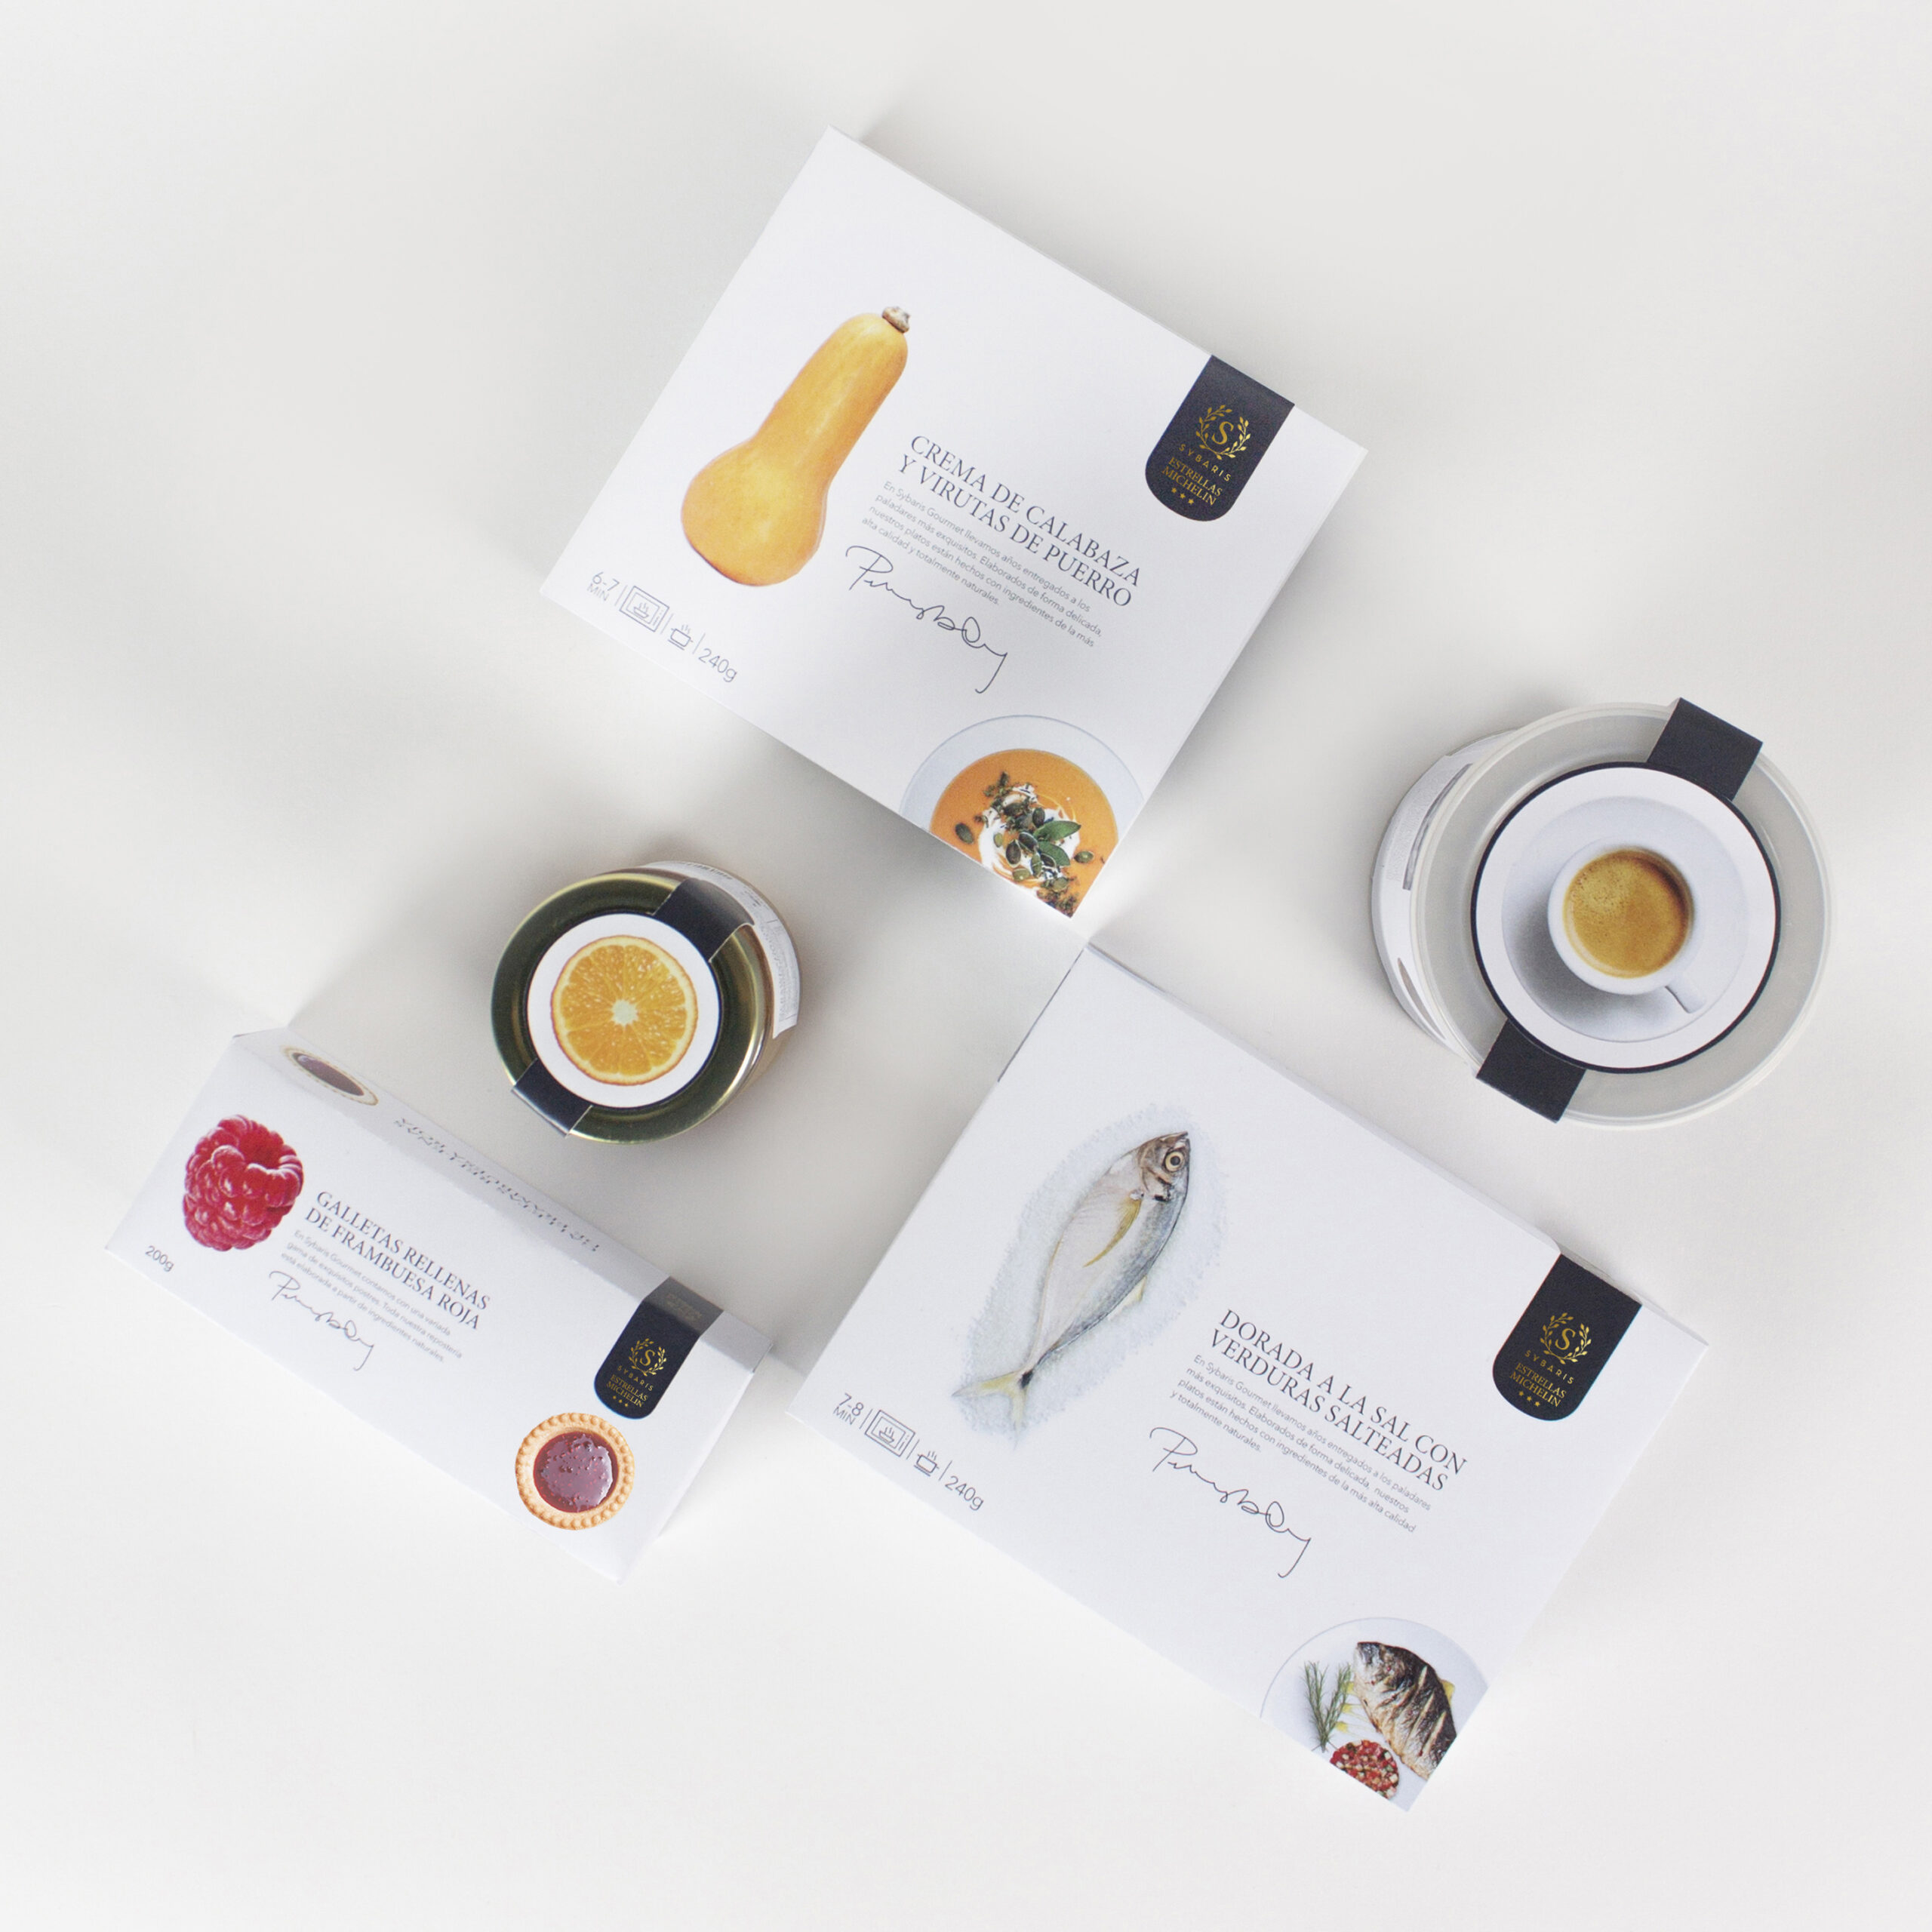 Sybaris Gourmet